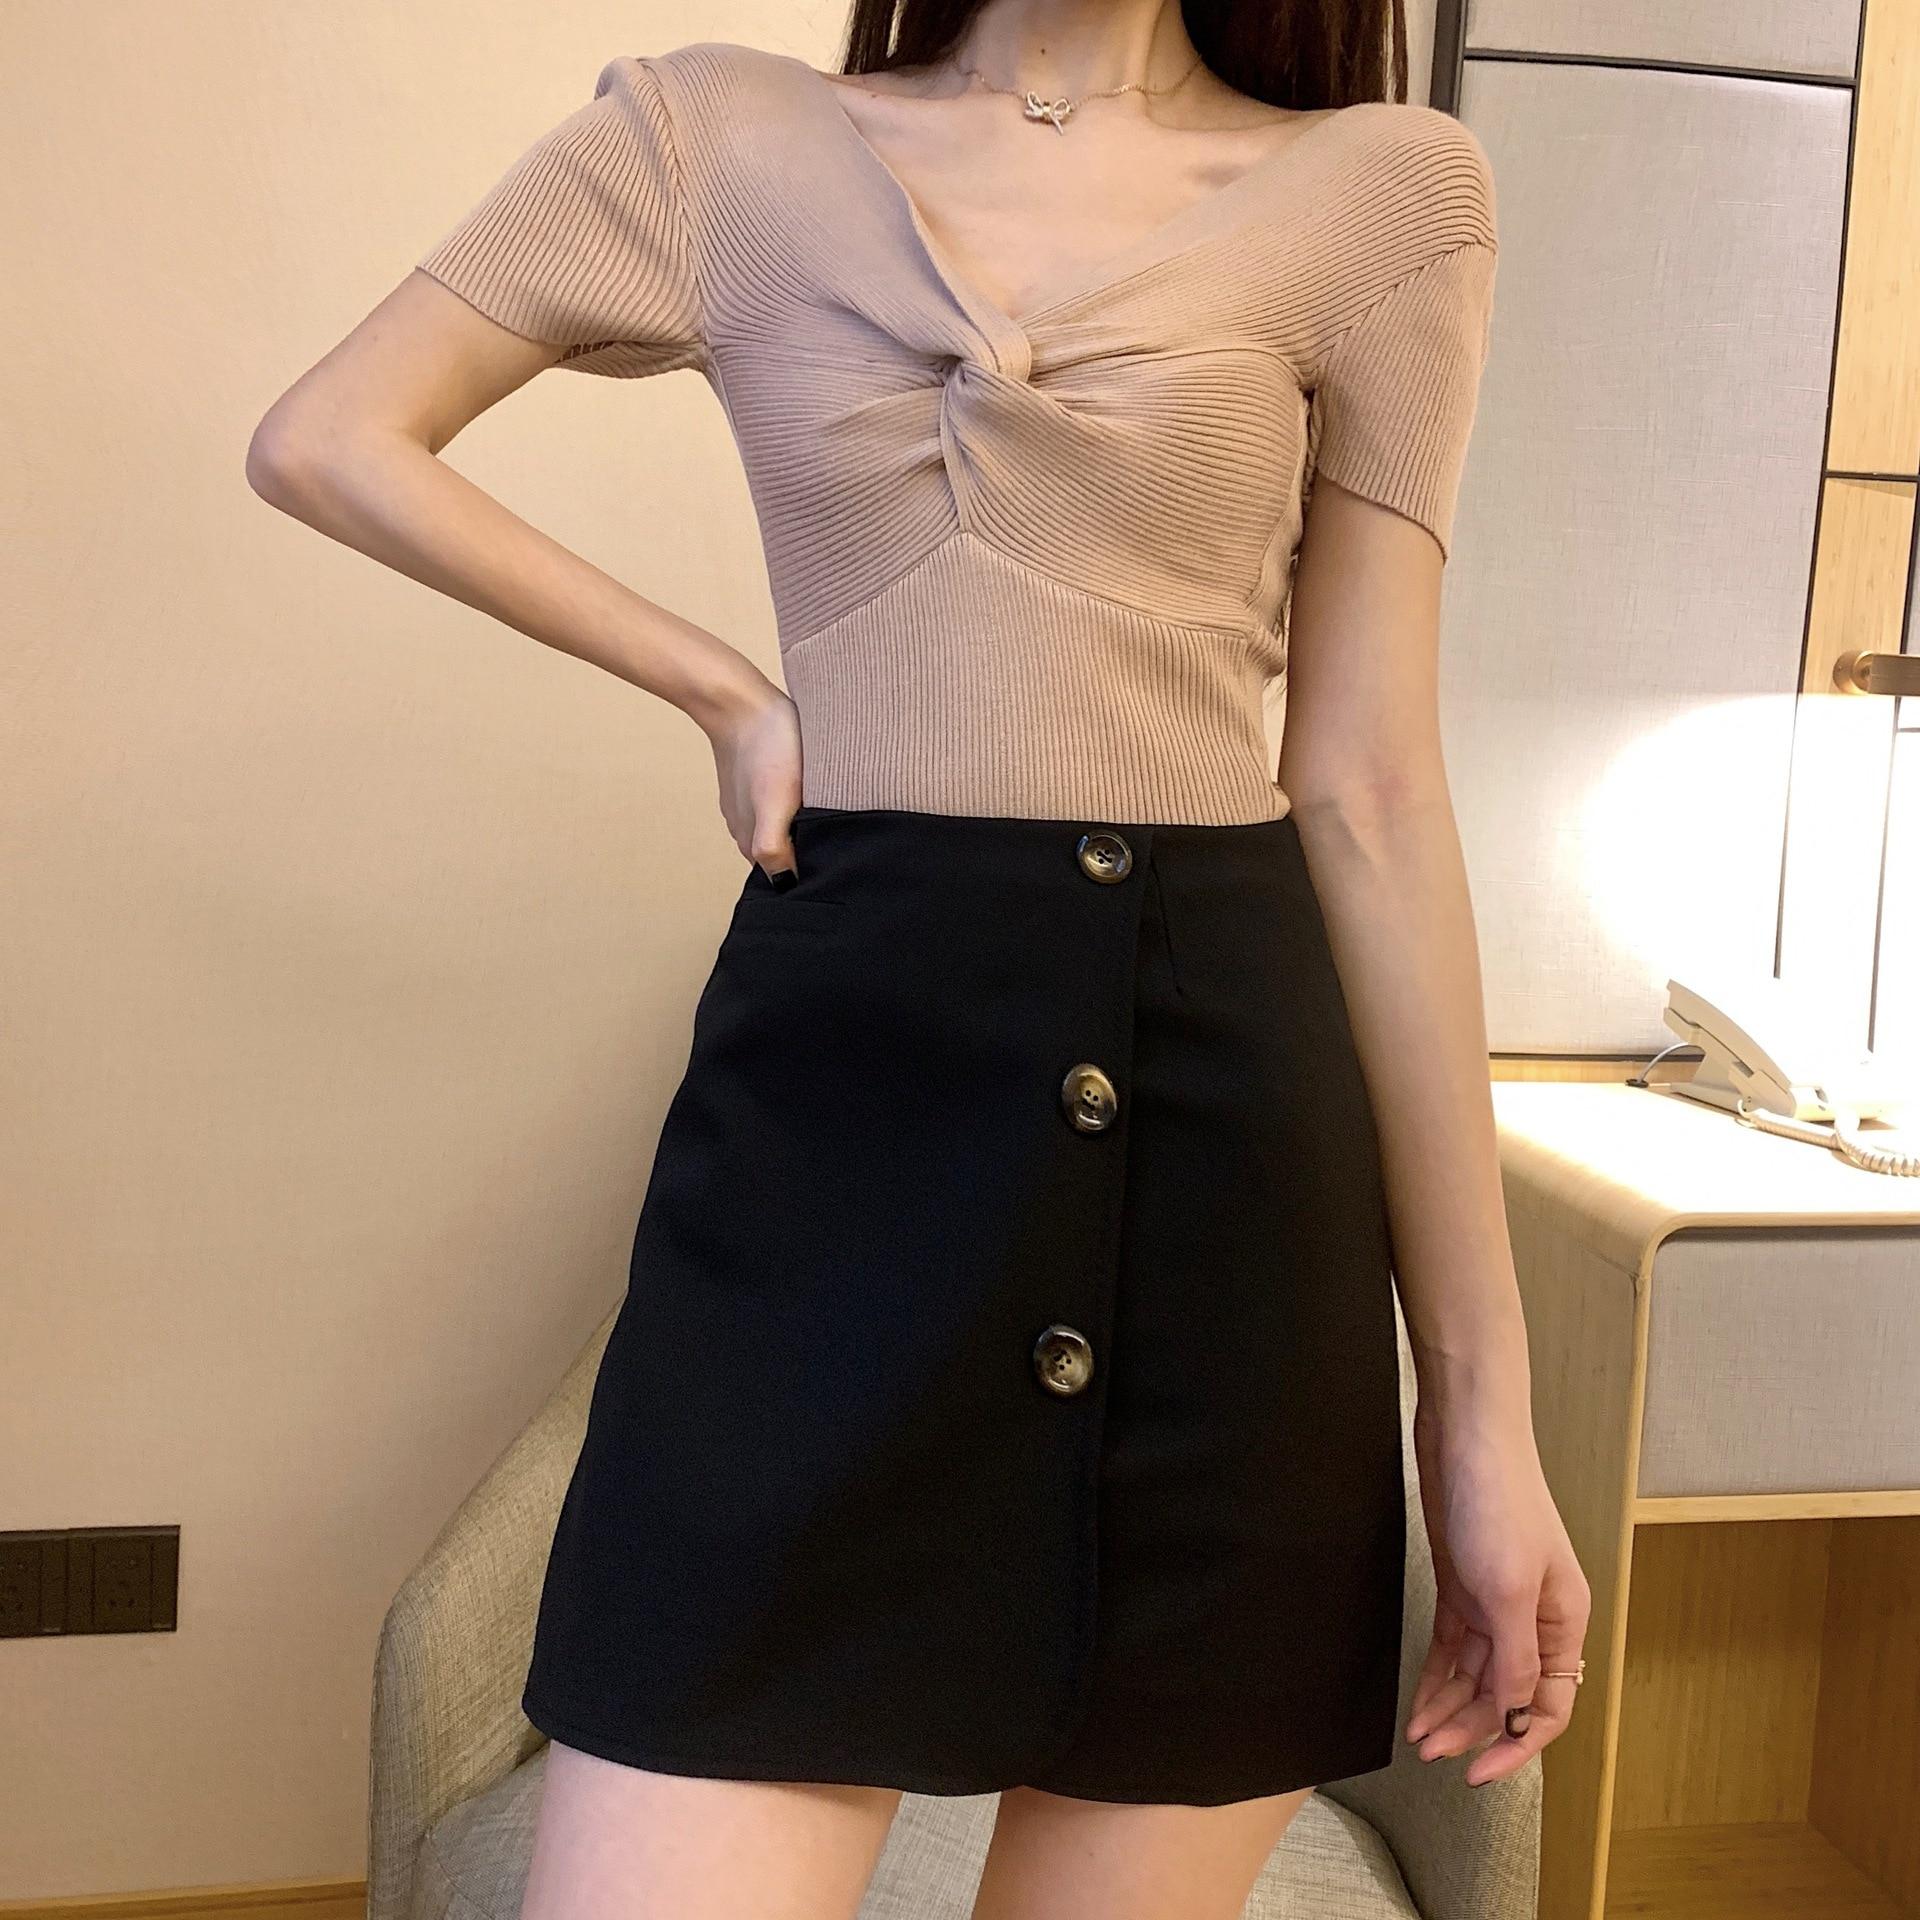 Photo Shoot 2019 New Style Single Breasted Skirt Korean-style CHIC High-waisted Versatile Slimming A- Line Short Skirt Children